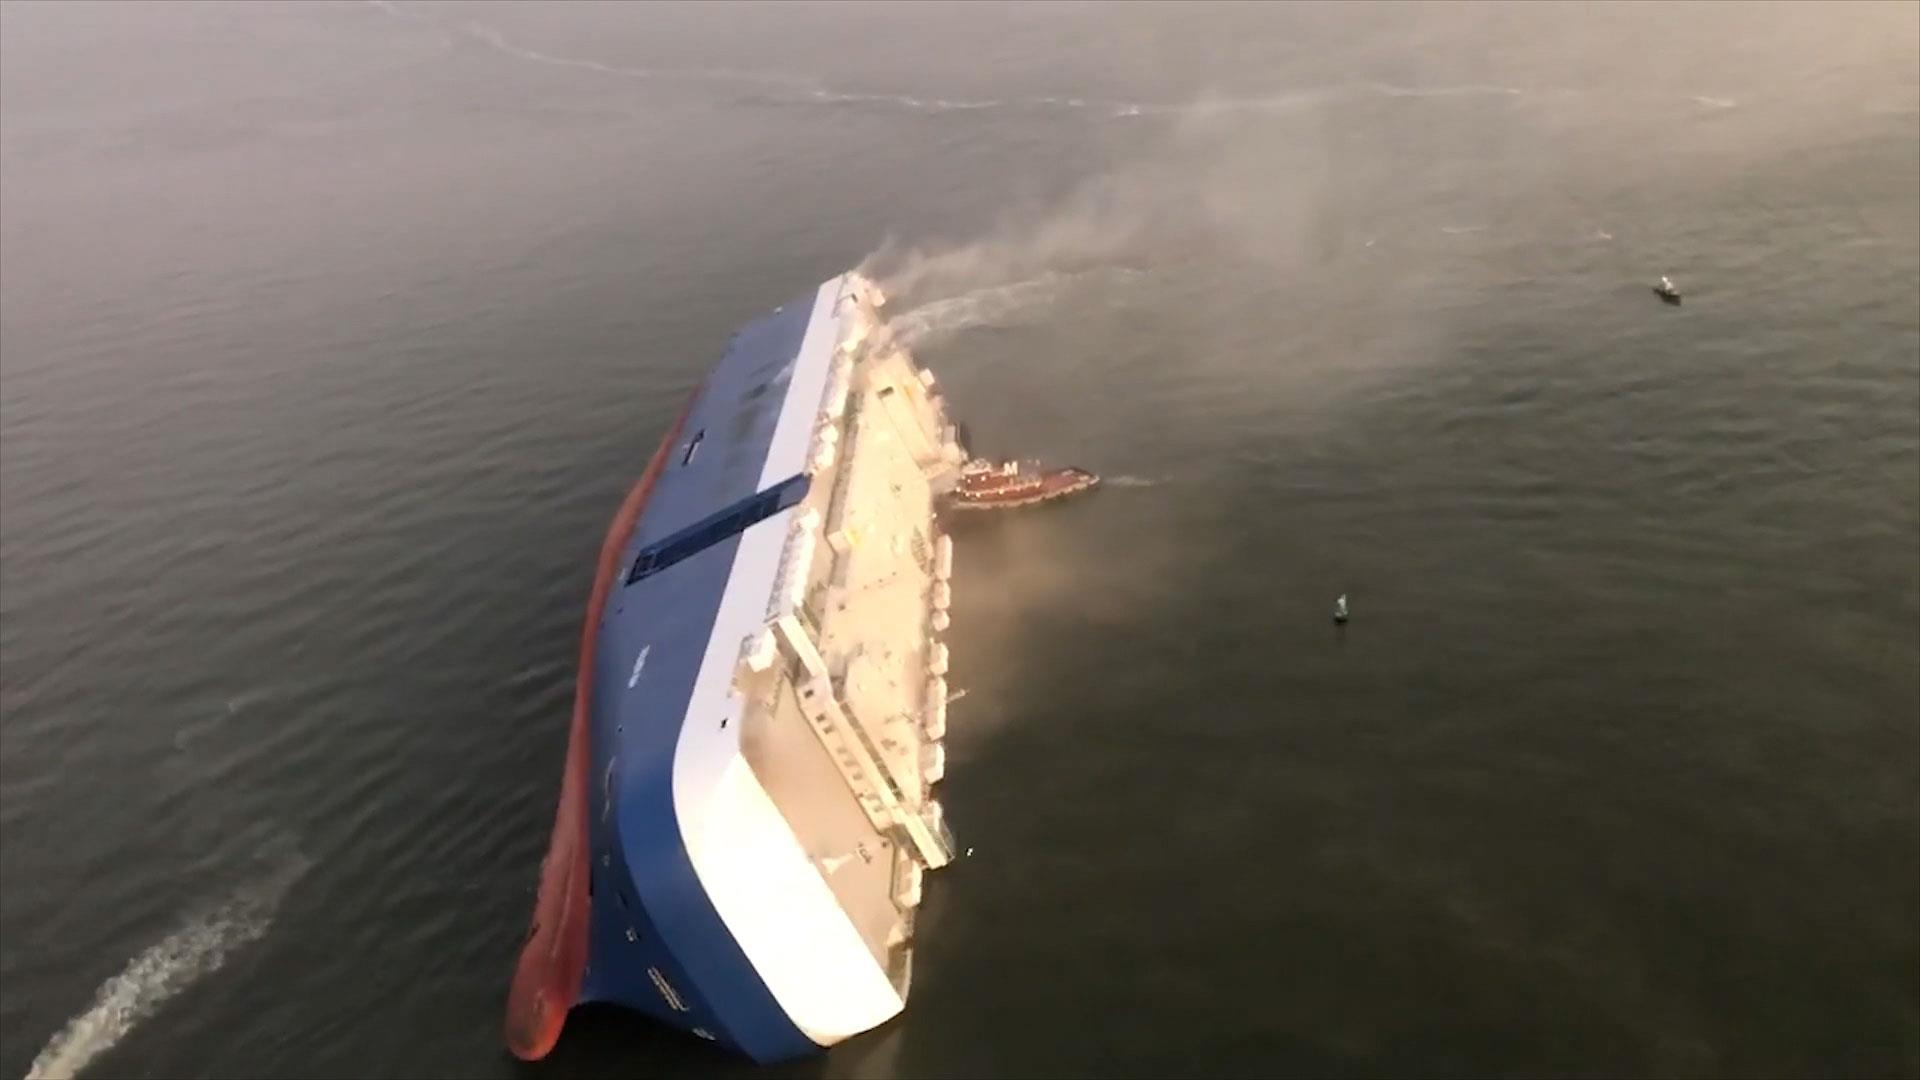 Video Shows Capsized Cargo Ship Near Georgia Coast